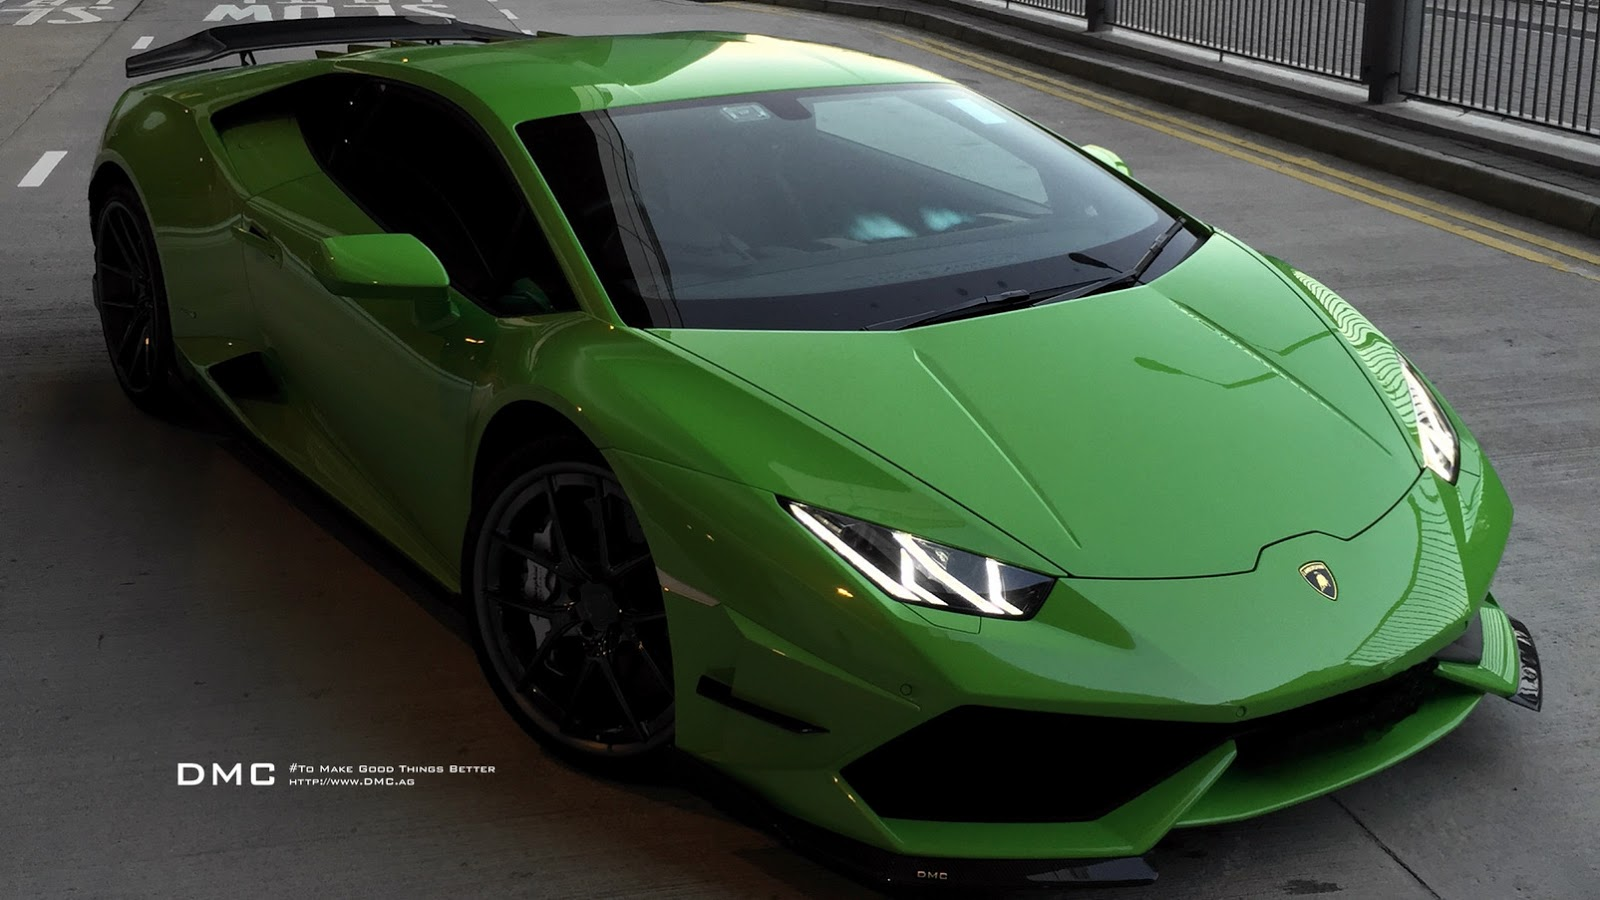 Dmc Gives Lamborghini Huracan A Complete Tune Up W Videos